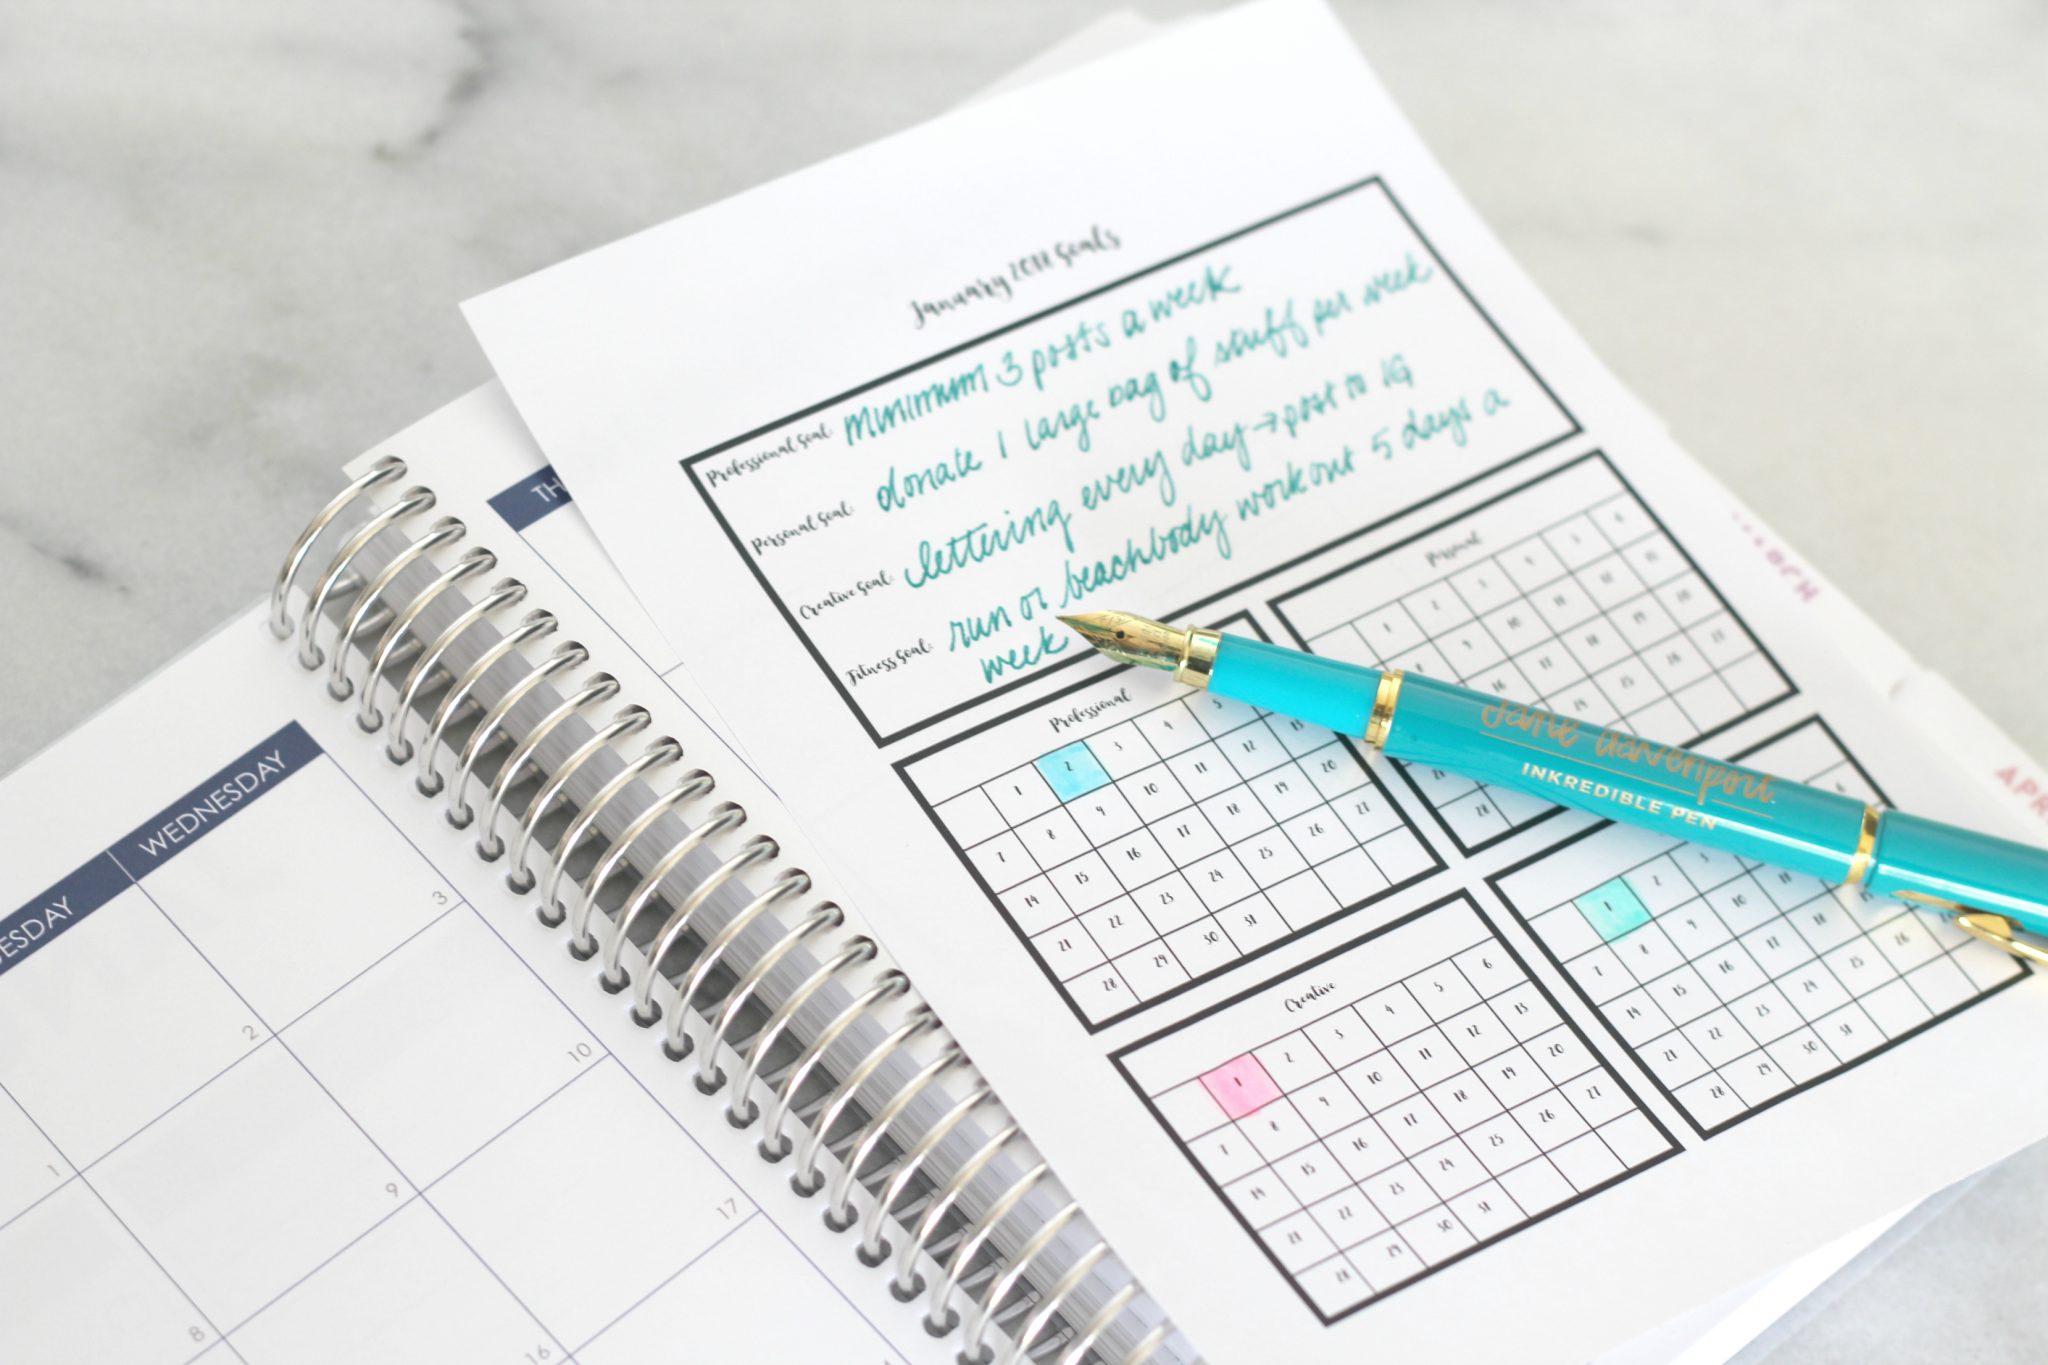 January 2018 Goal Tracking Planner Printable